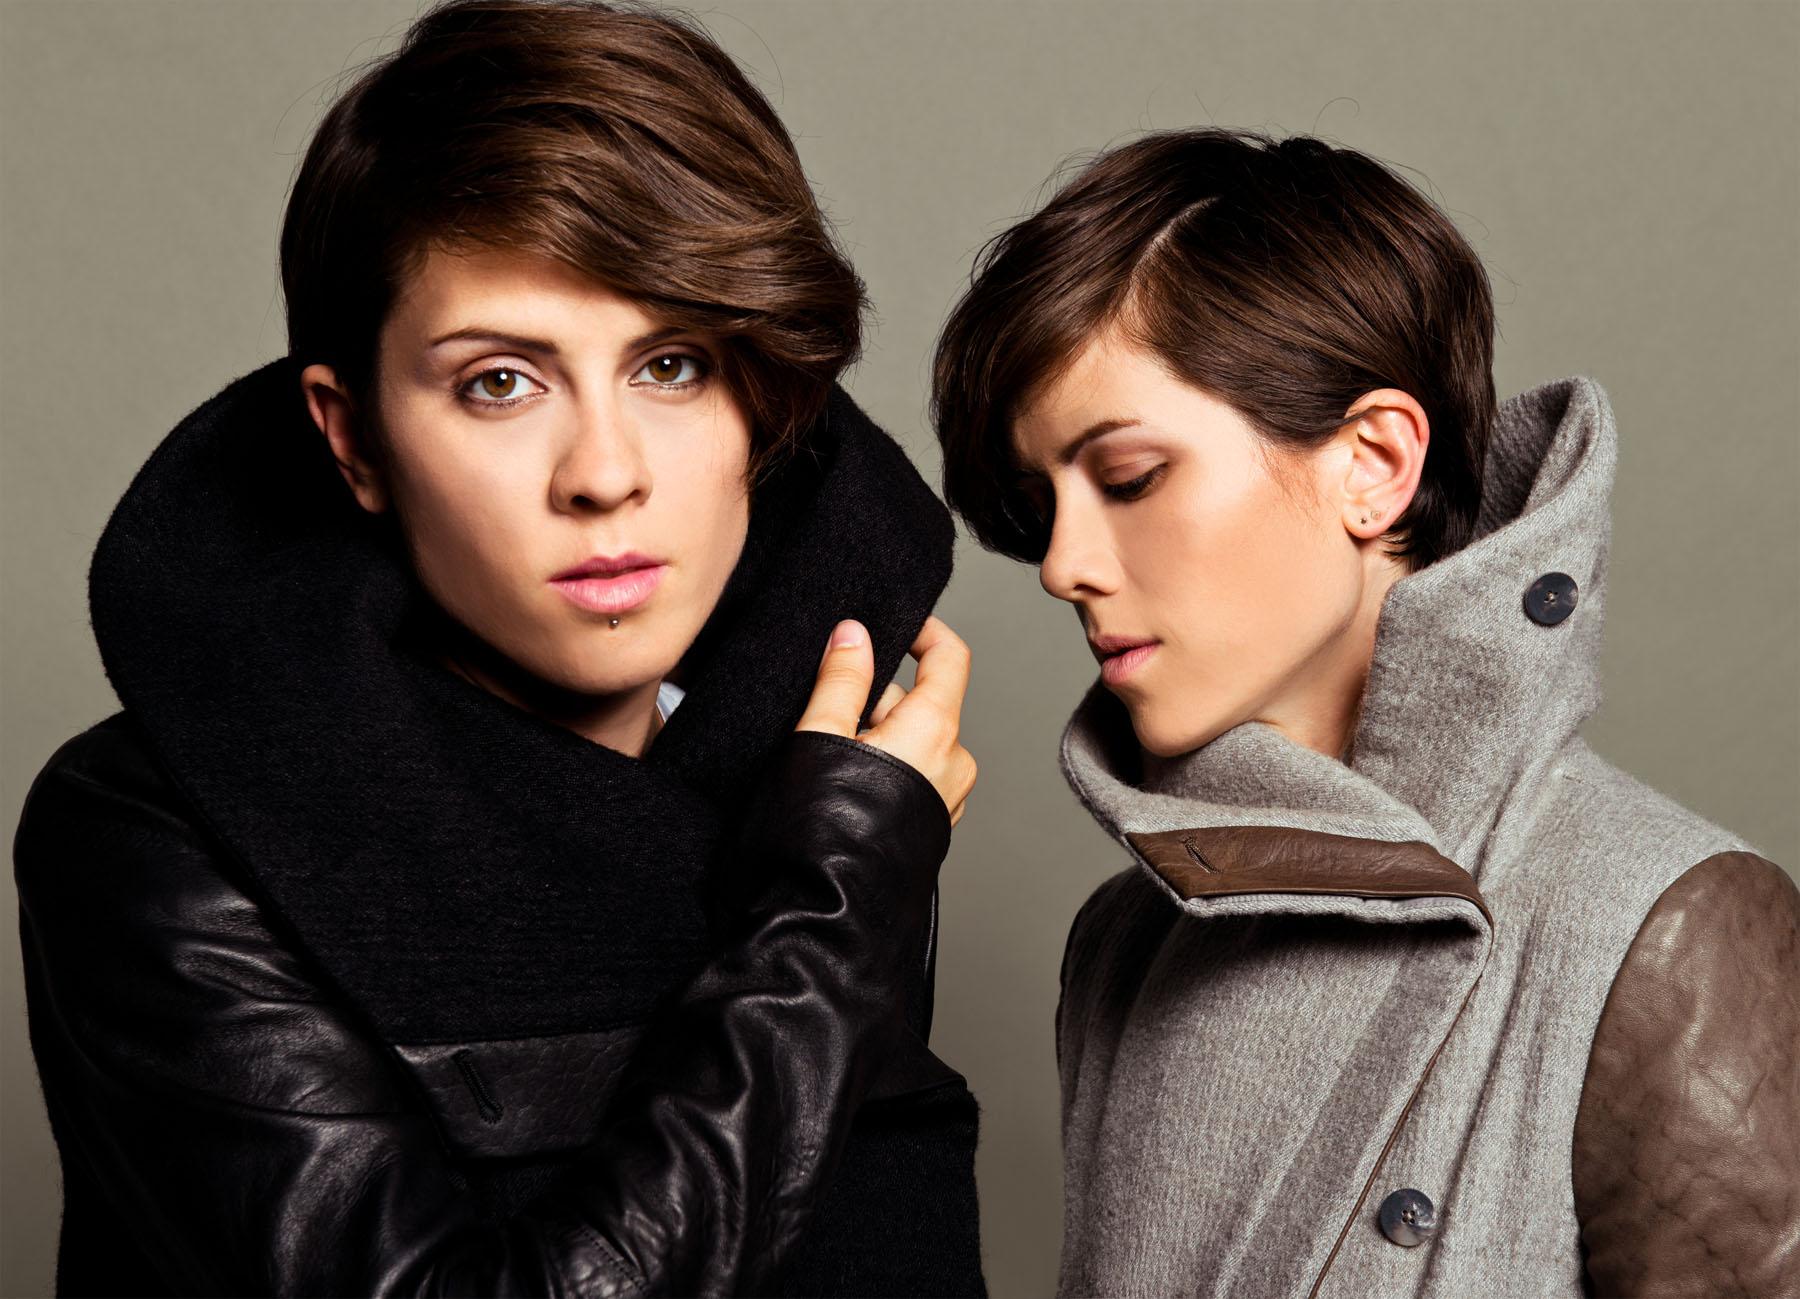 Tegan and sara ethnicity